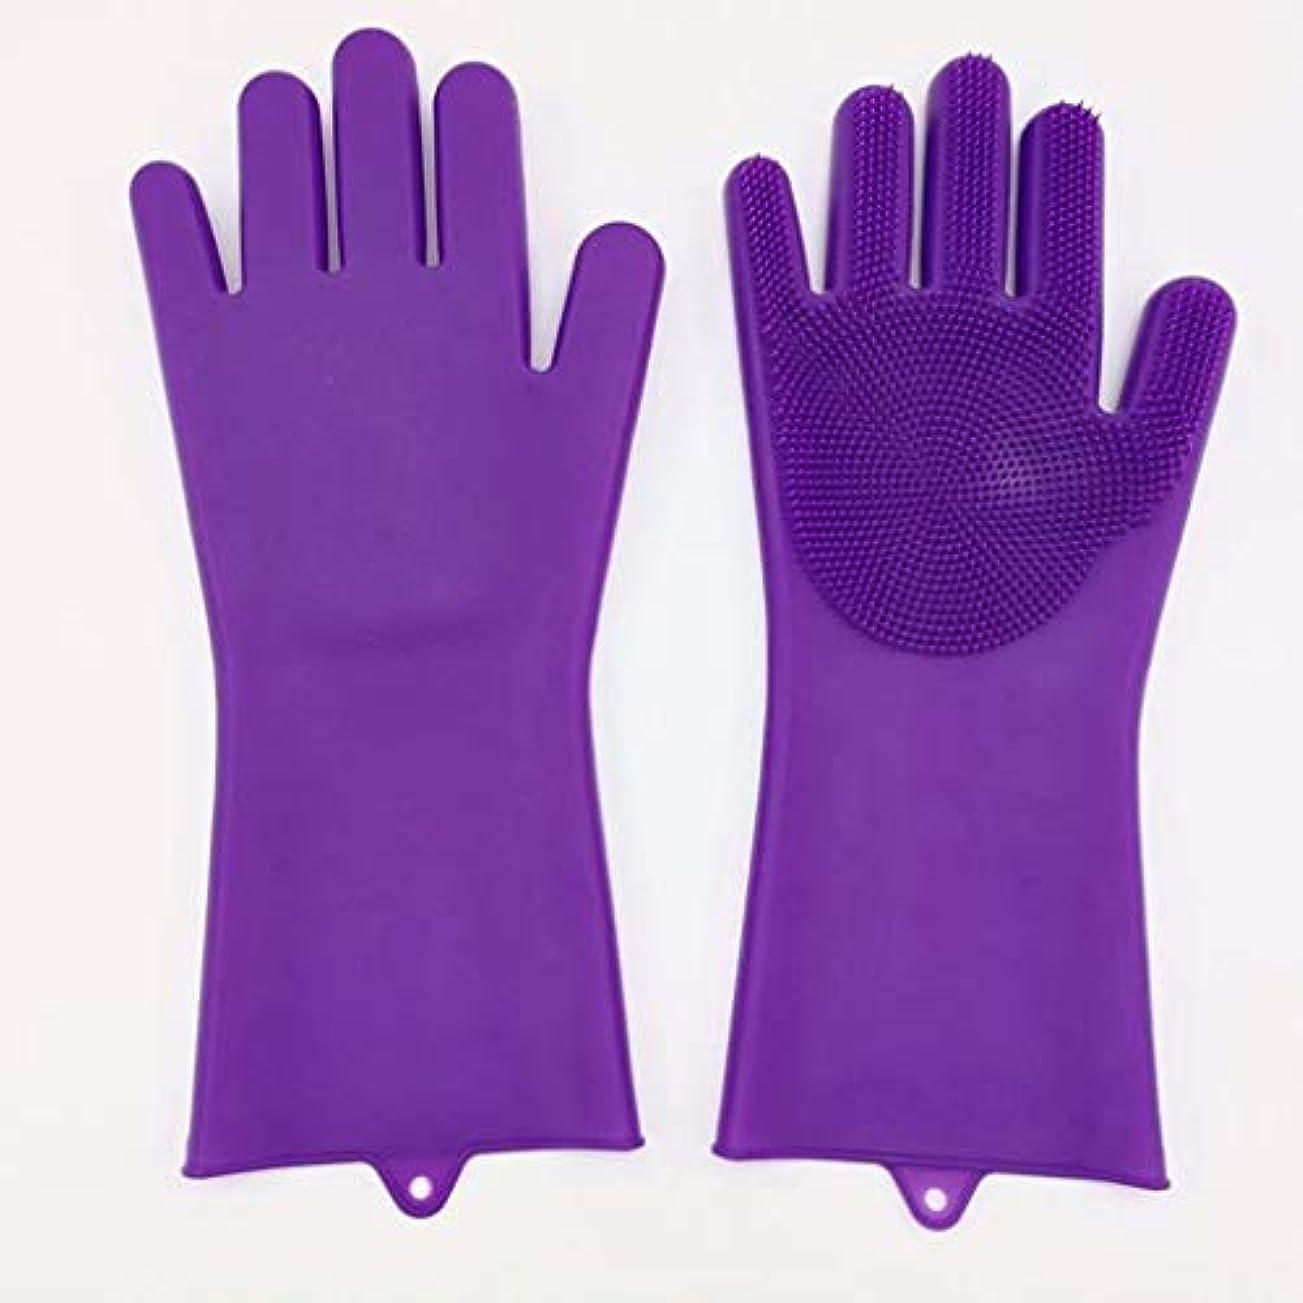 LWBUKK 食器洗い用シリコーン手袋、台所掃除用マジックグローブ、滑り止め防水高温手袋3色オプション 手袋 (Color : Purple)